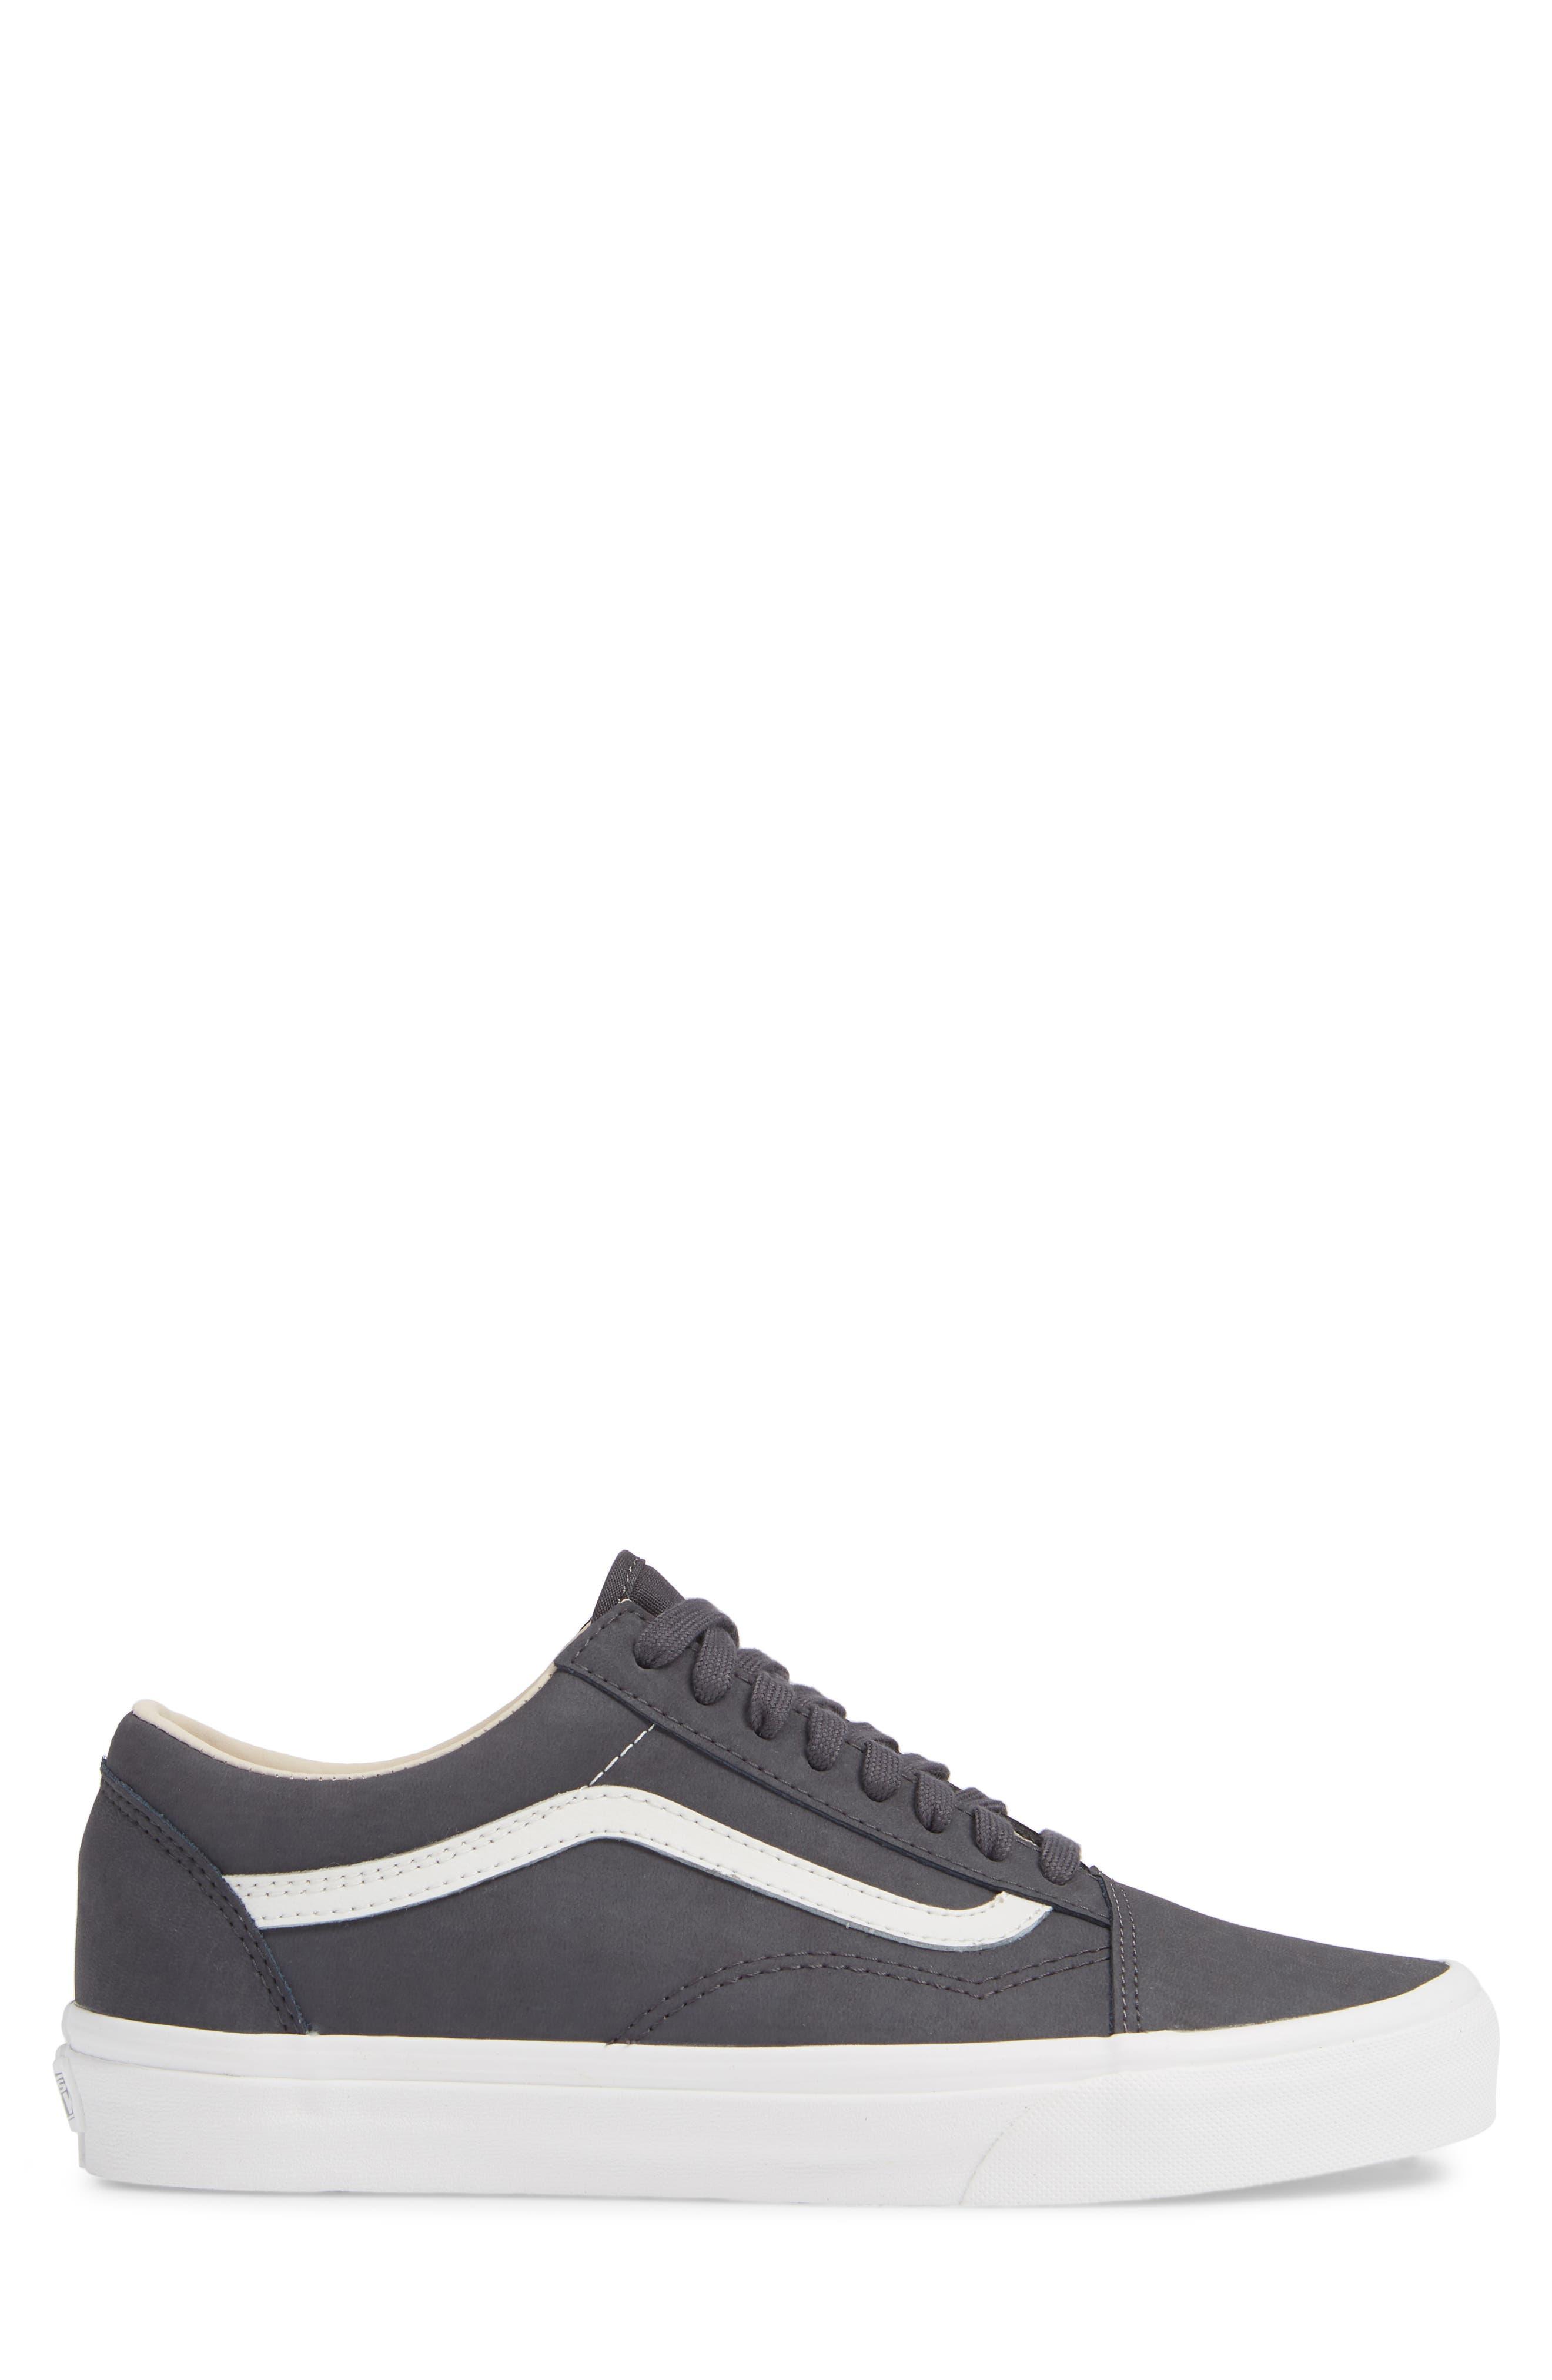 Buck Old Skool Sneaker,                             Alternate thumbnail 3, color,                             021